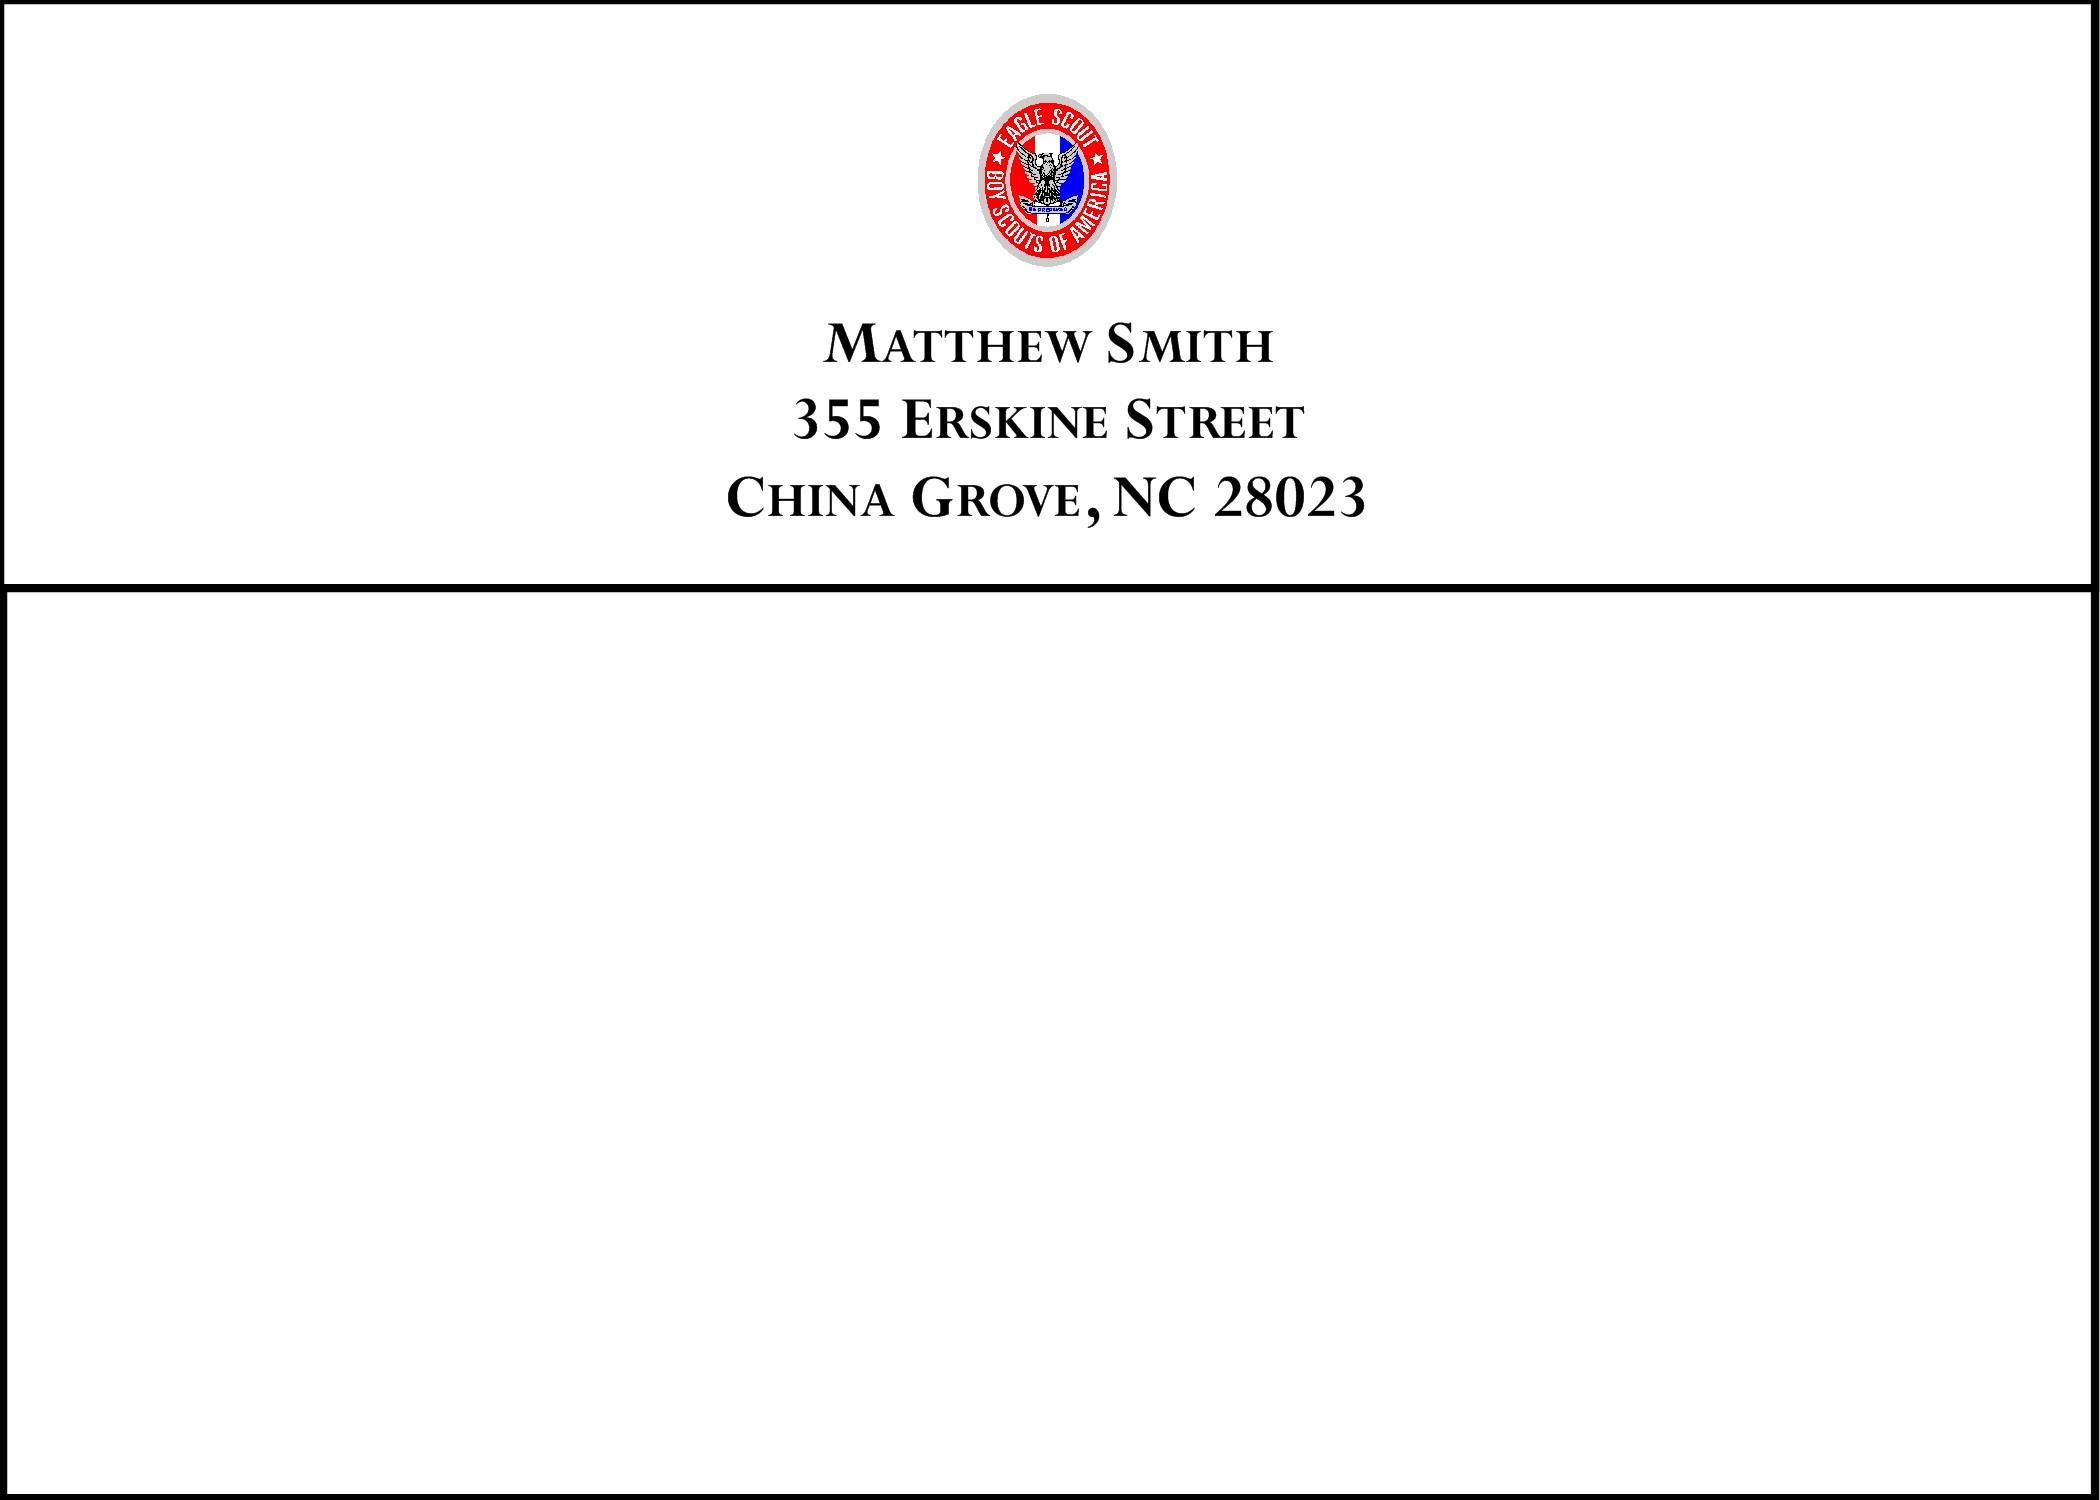 Envelope2 Jpg